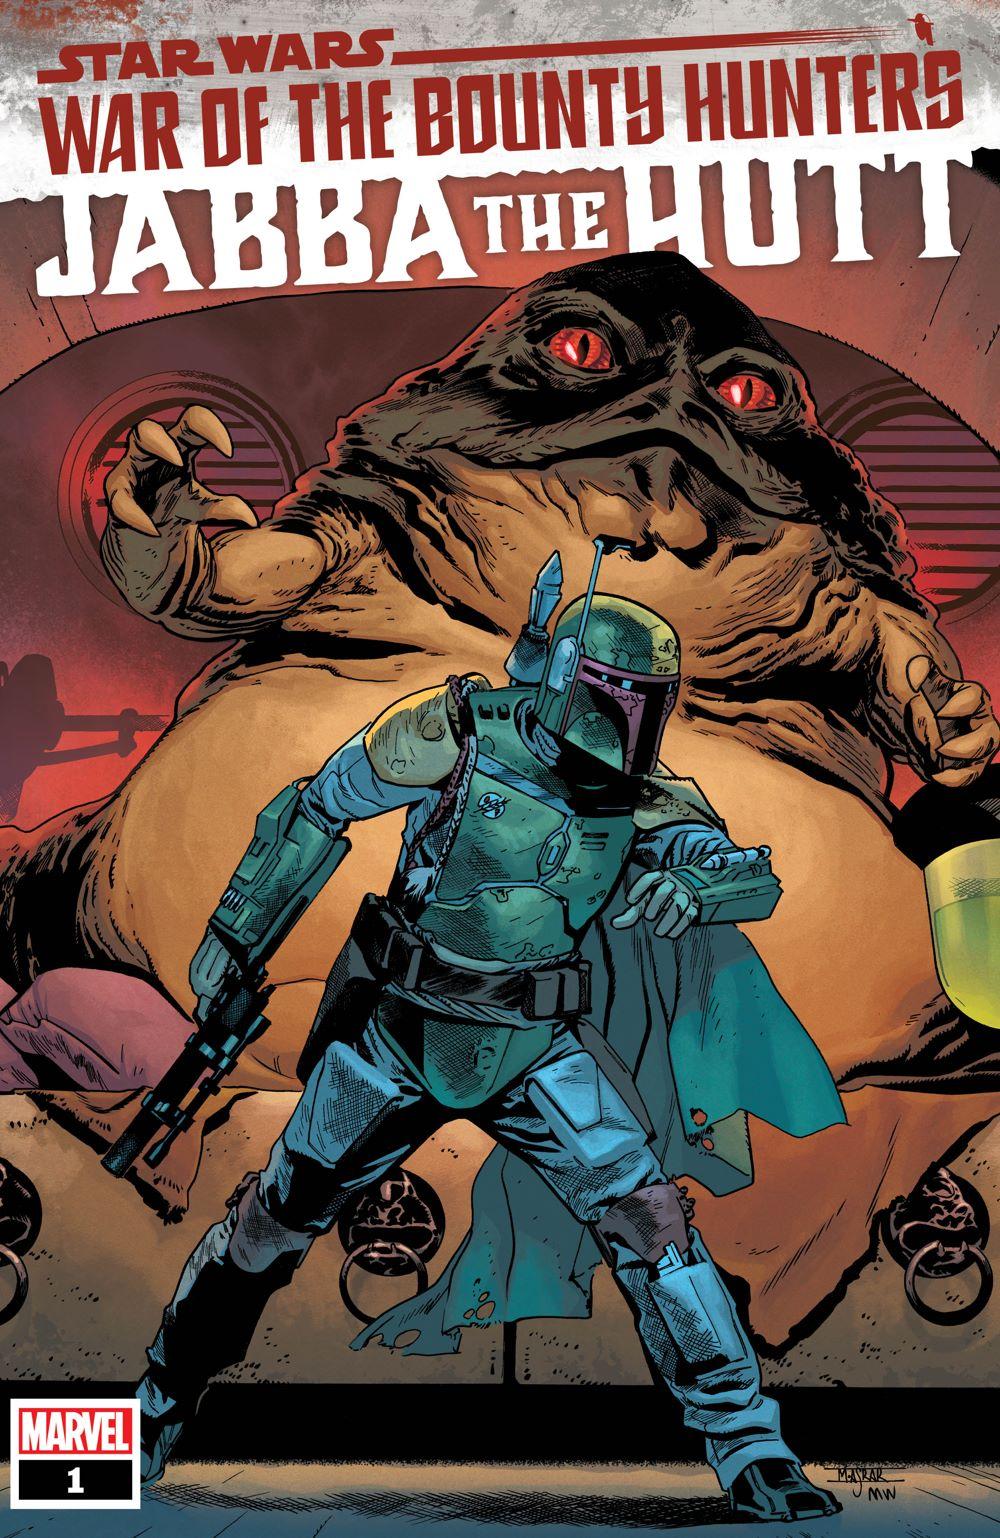 2021_STW-WOTBH_JABBA Star Wars hunts for Han Solo in WAR OF THE BOUNTY HUNTERS